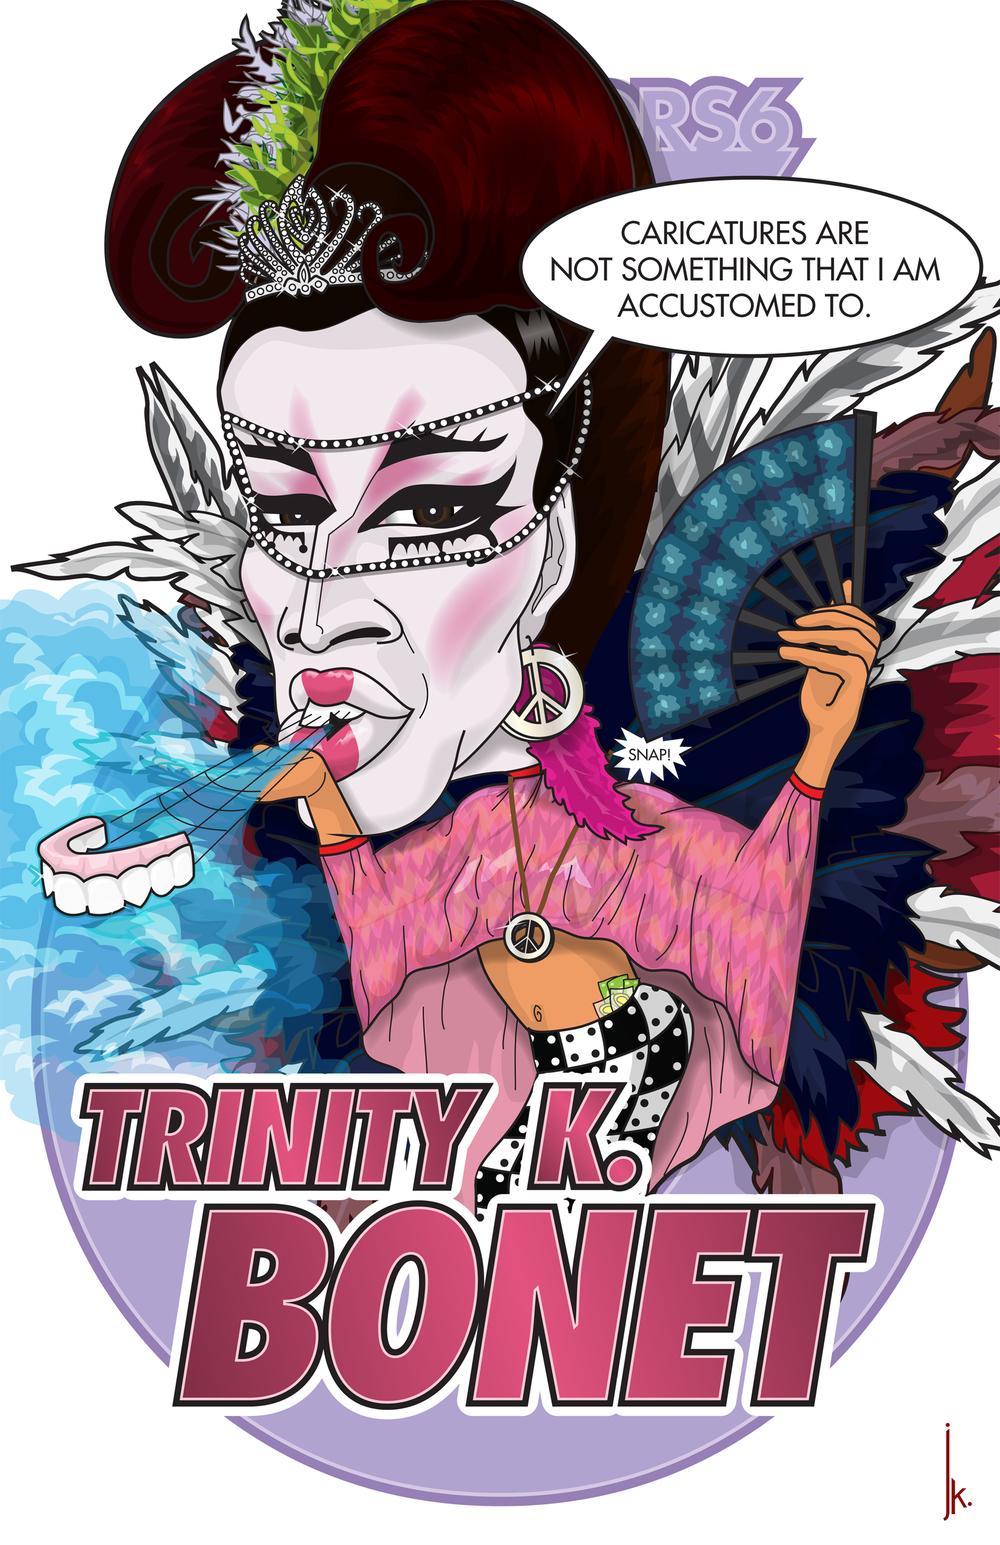 RDRs6_Trinity_poster2_web.jpg